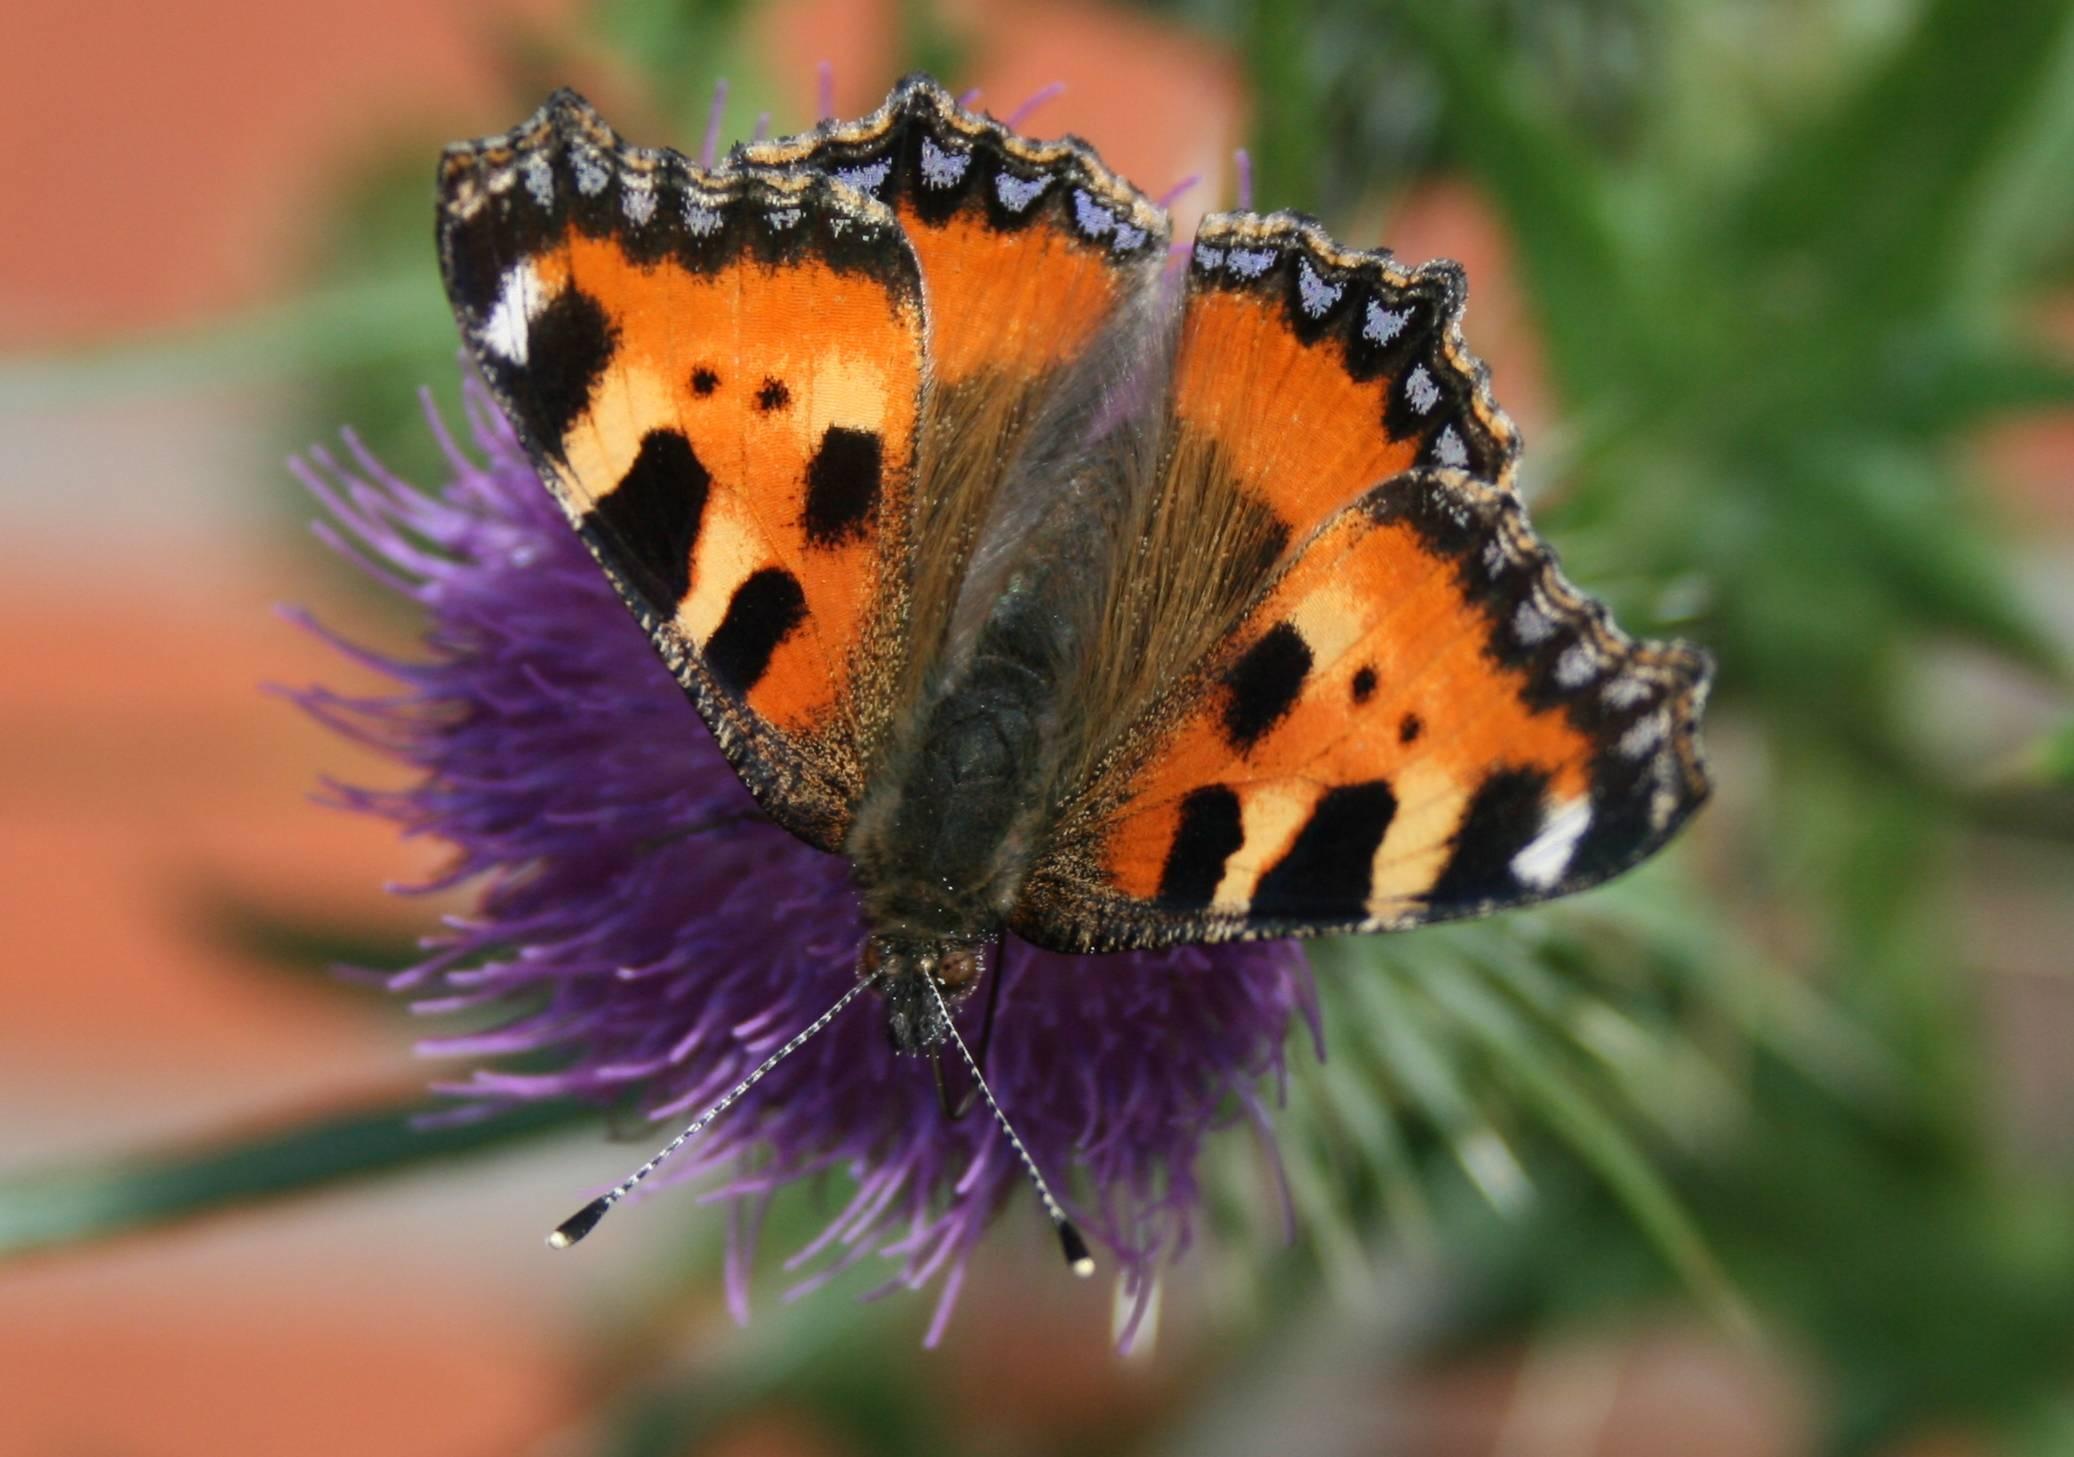 free images nature blossom wing flower bloom summer orange